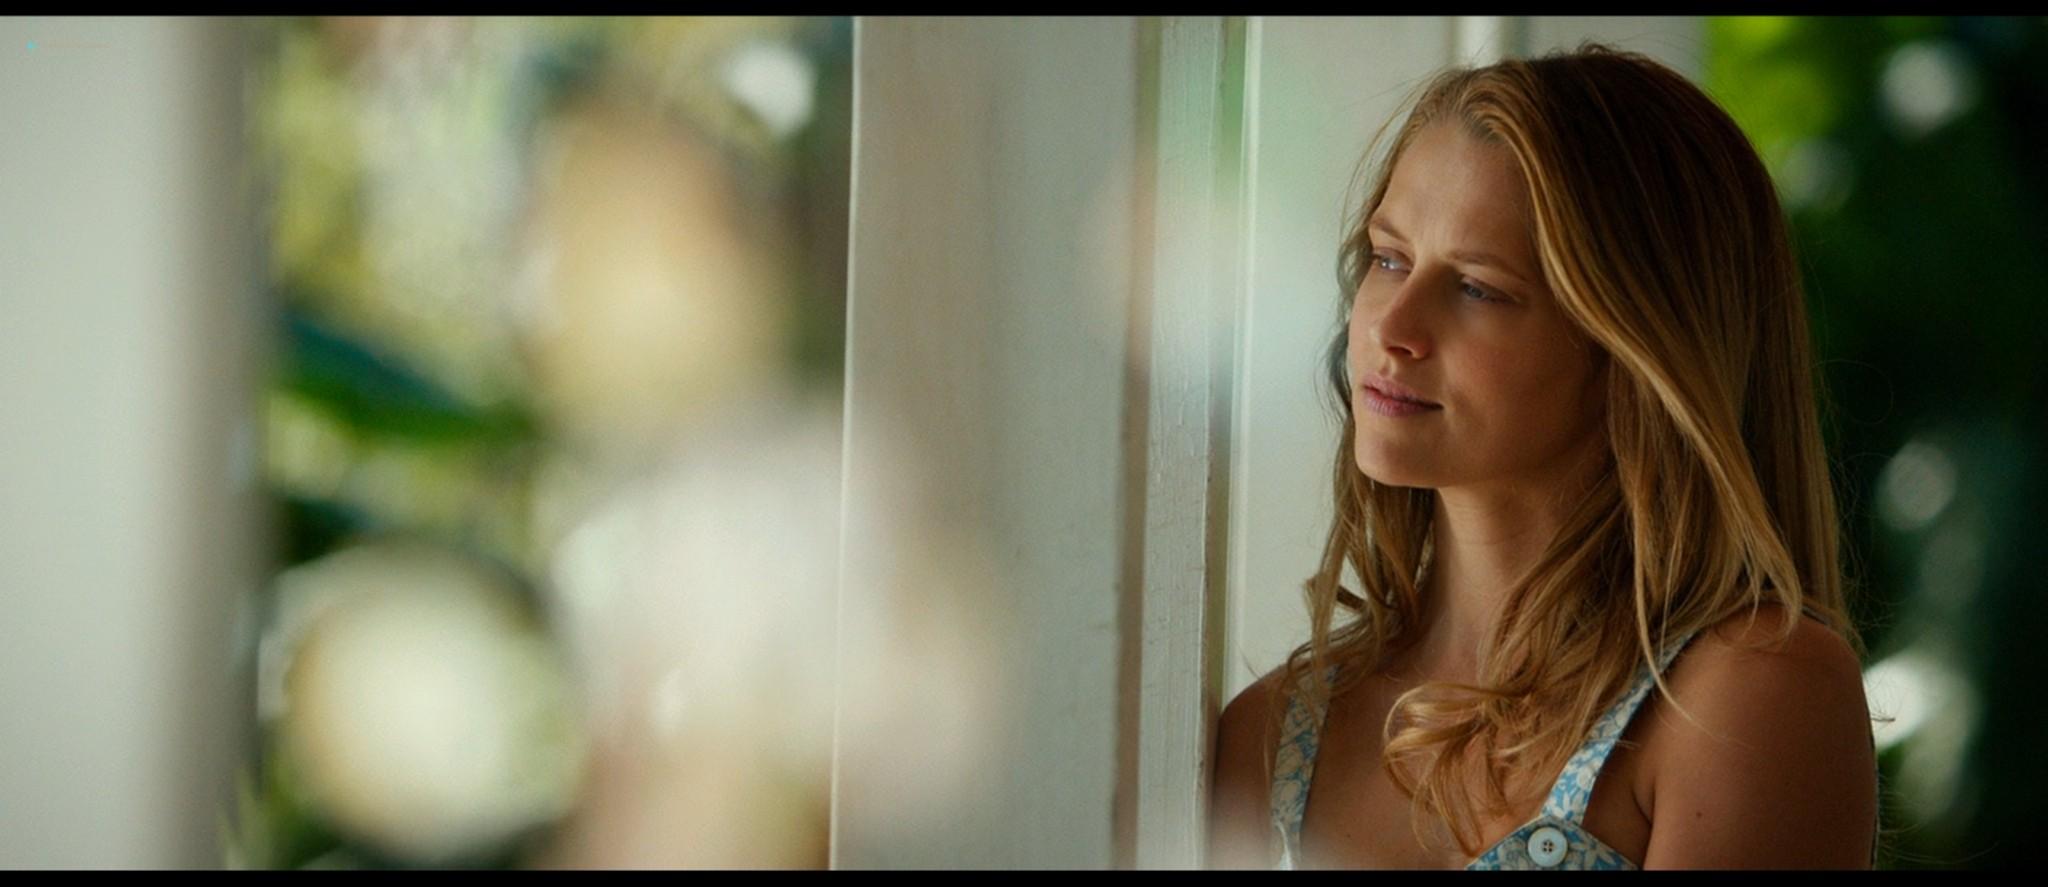 Teresa Palmer hot bikini and Maggie Grace, Alexandra Daddario hot too - The Choice (2016) HD 1080p BluRay (18)